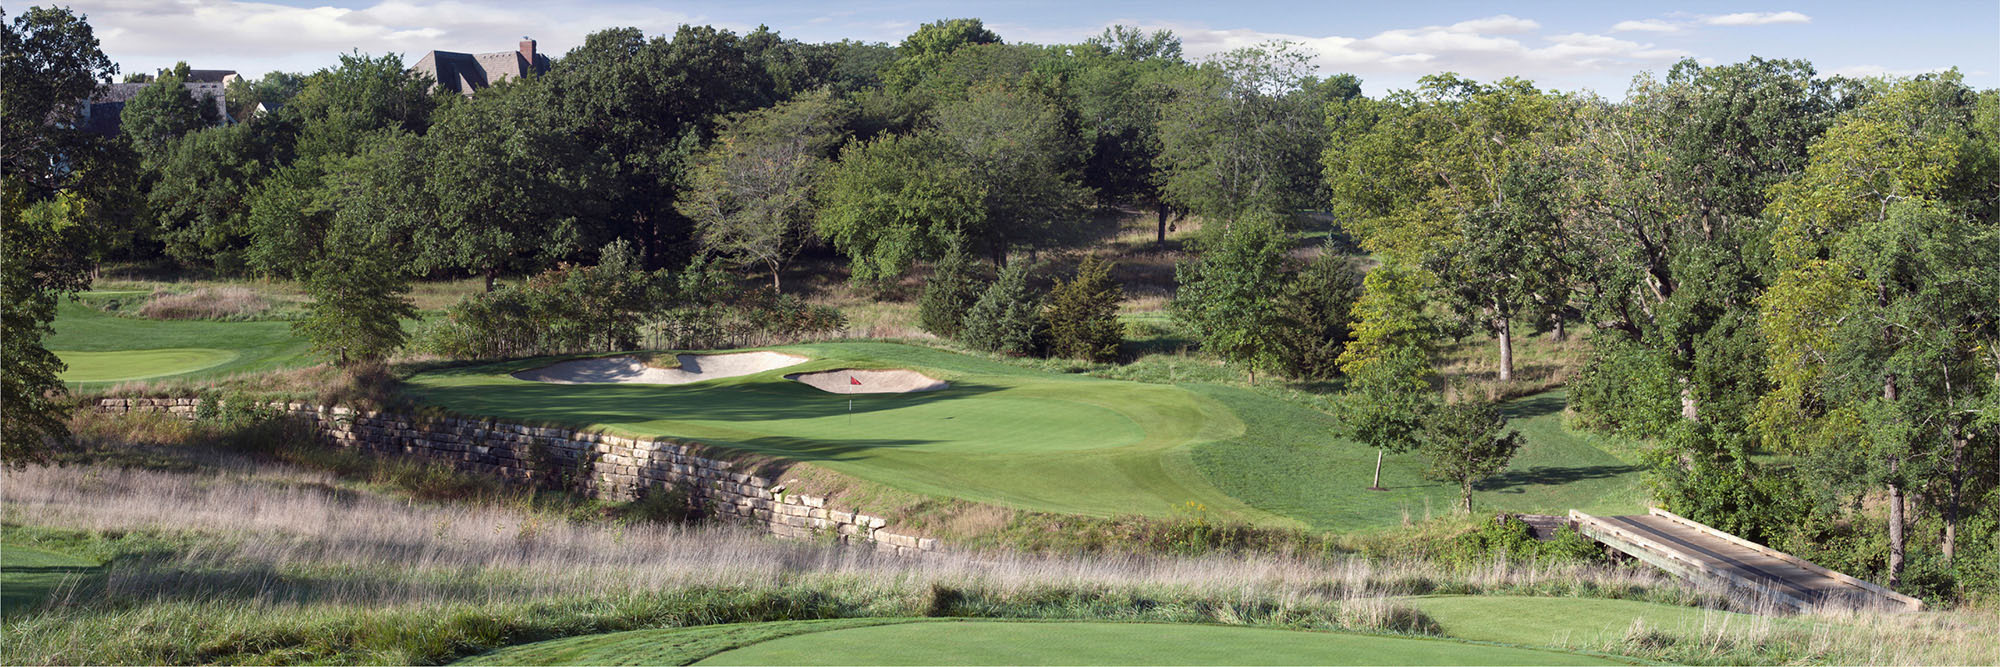 Golf Course Image - Hallbrook No. 15